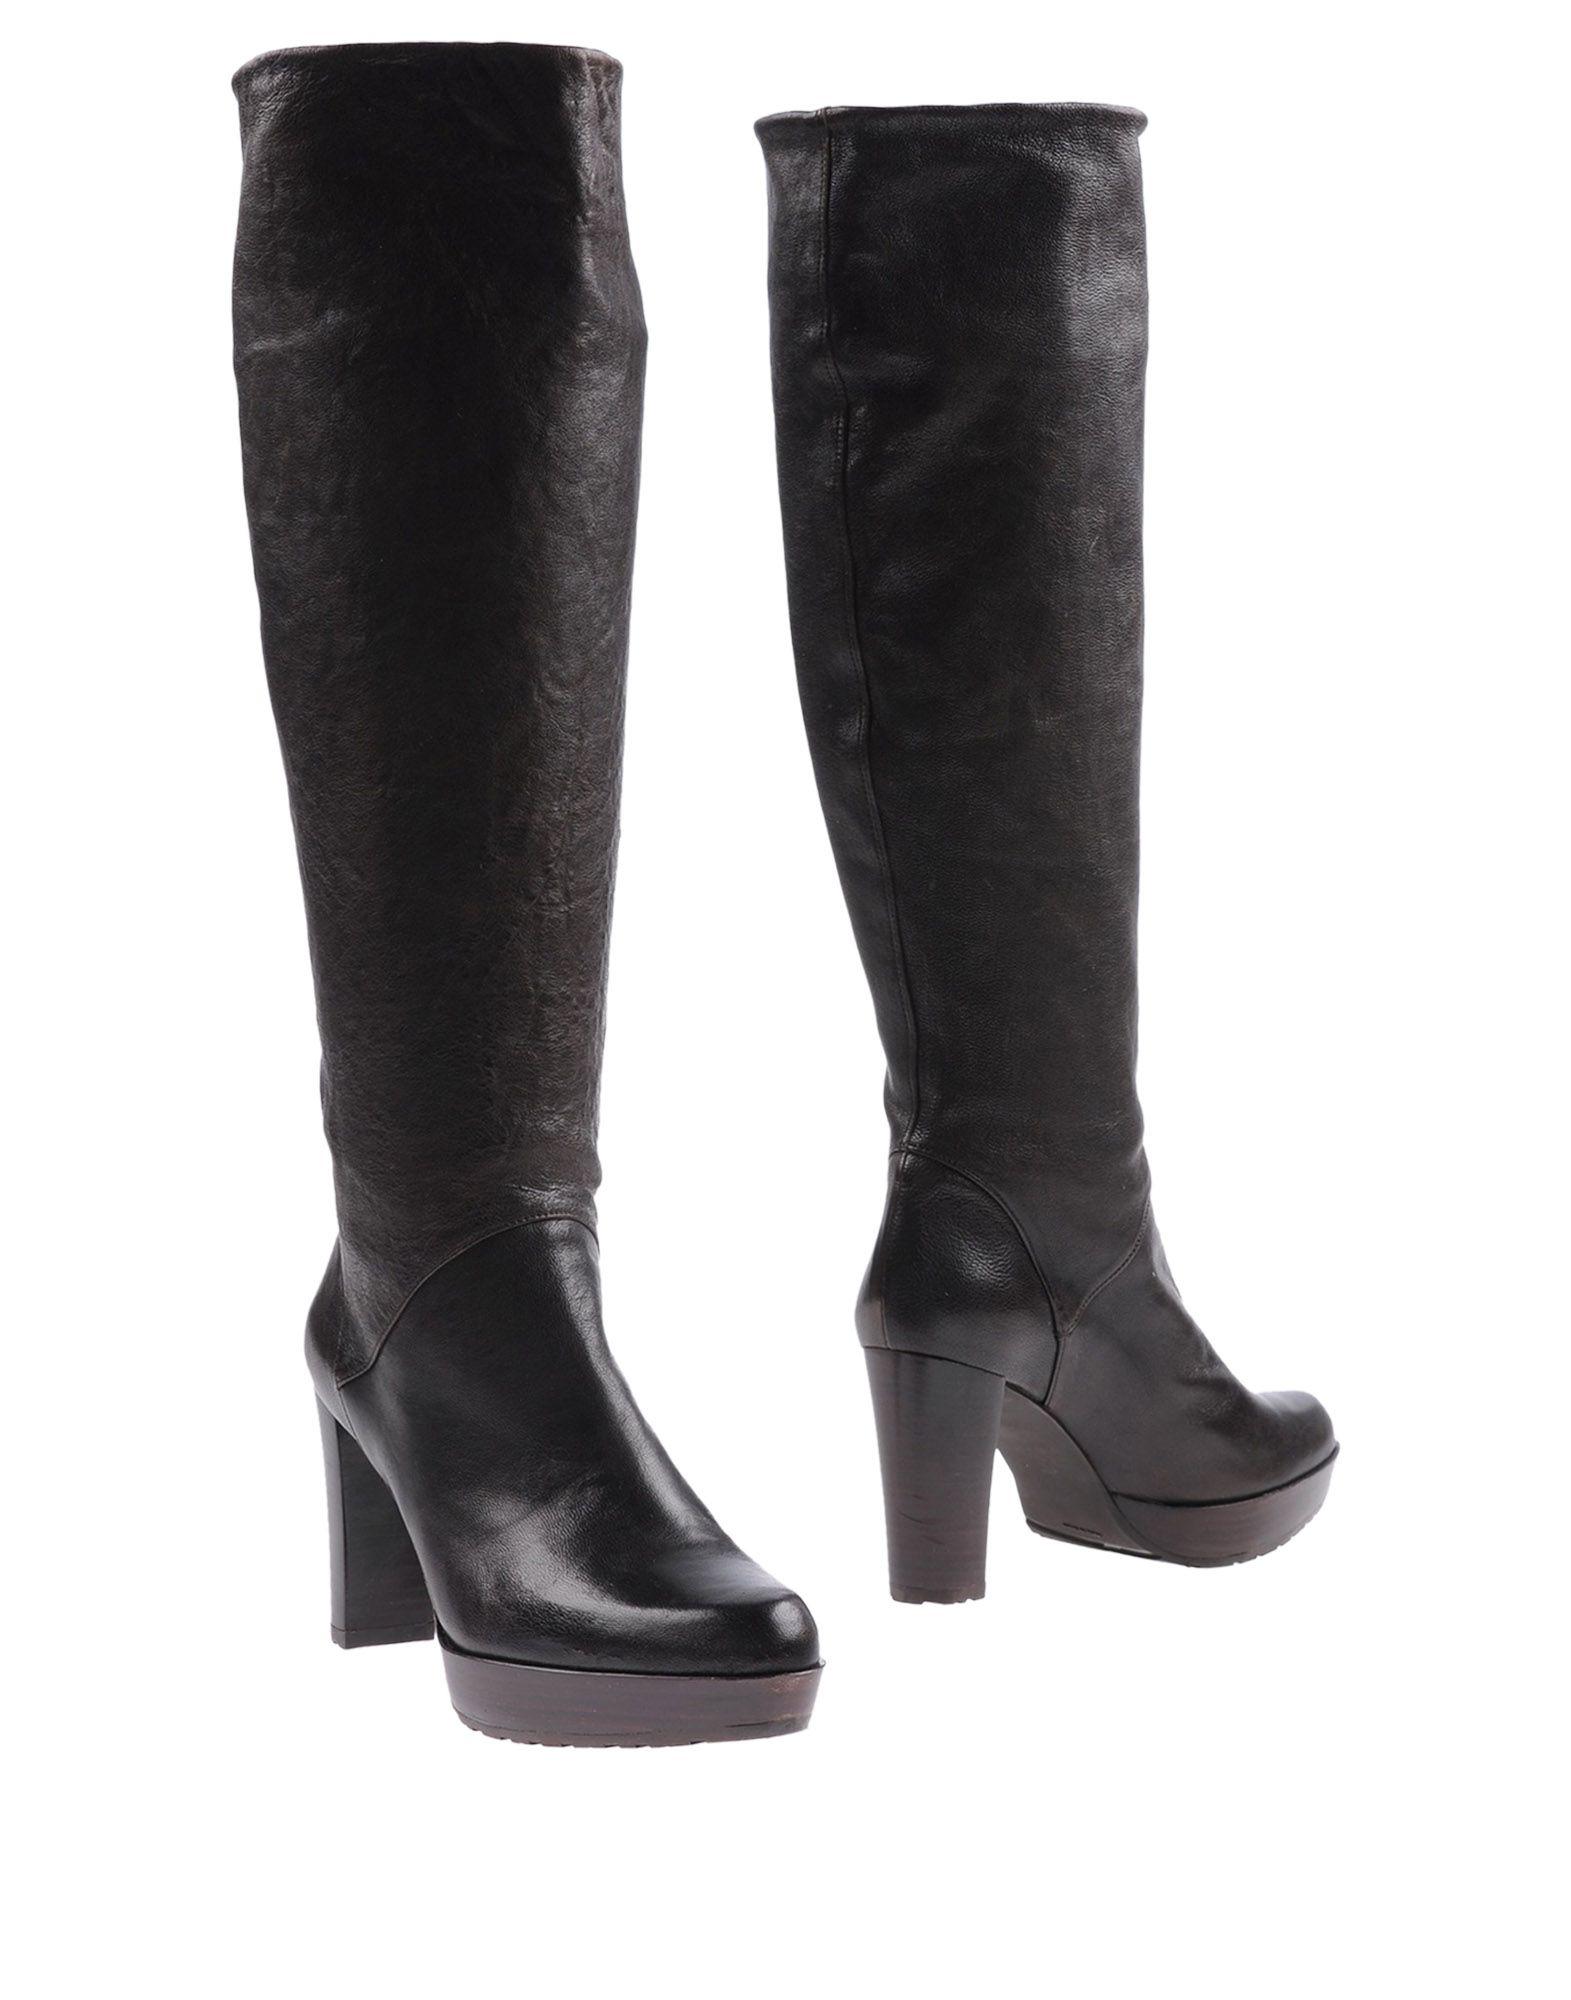 Stuart Weitzman Stiefel Damen Schuhe  11142939GRGünstige gut aussehende Schuhe Damen 81ac3a